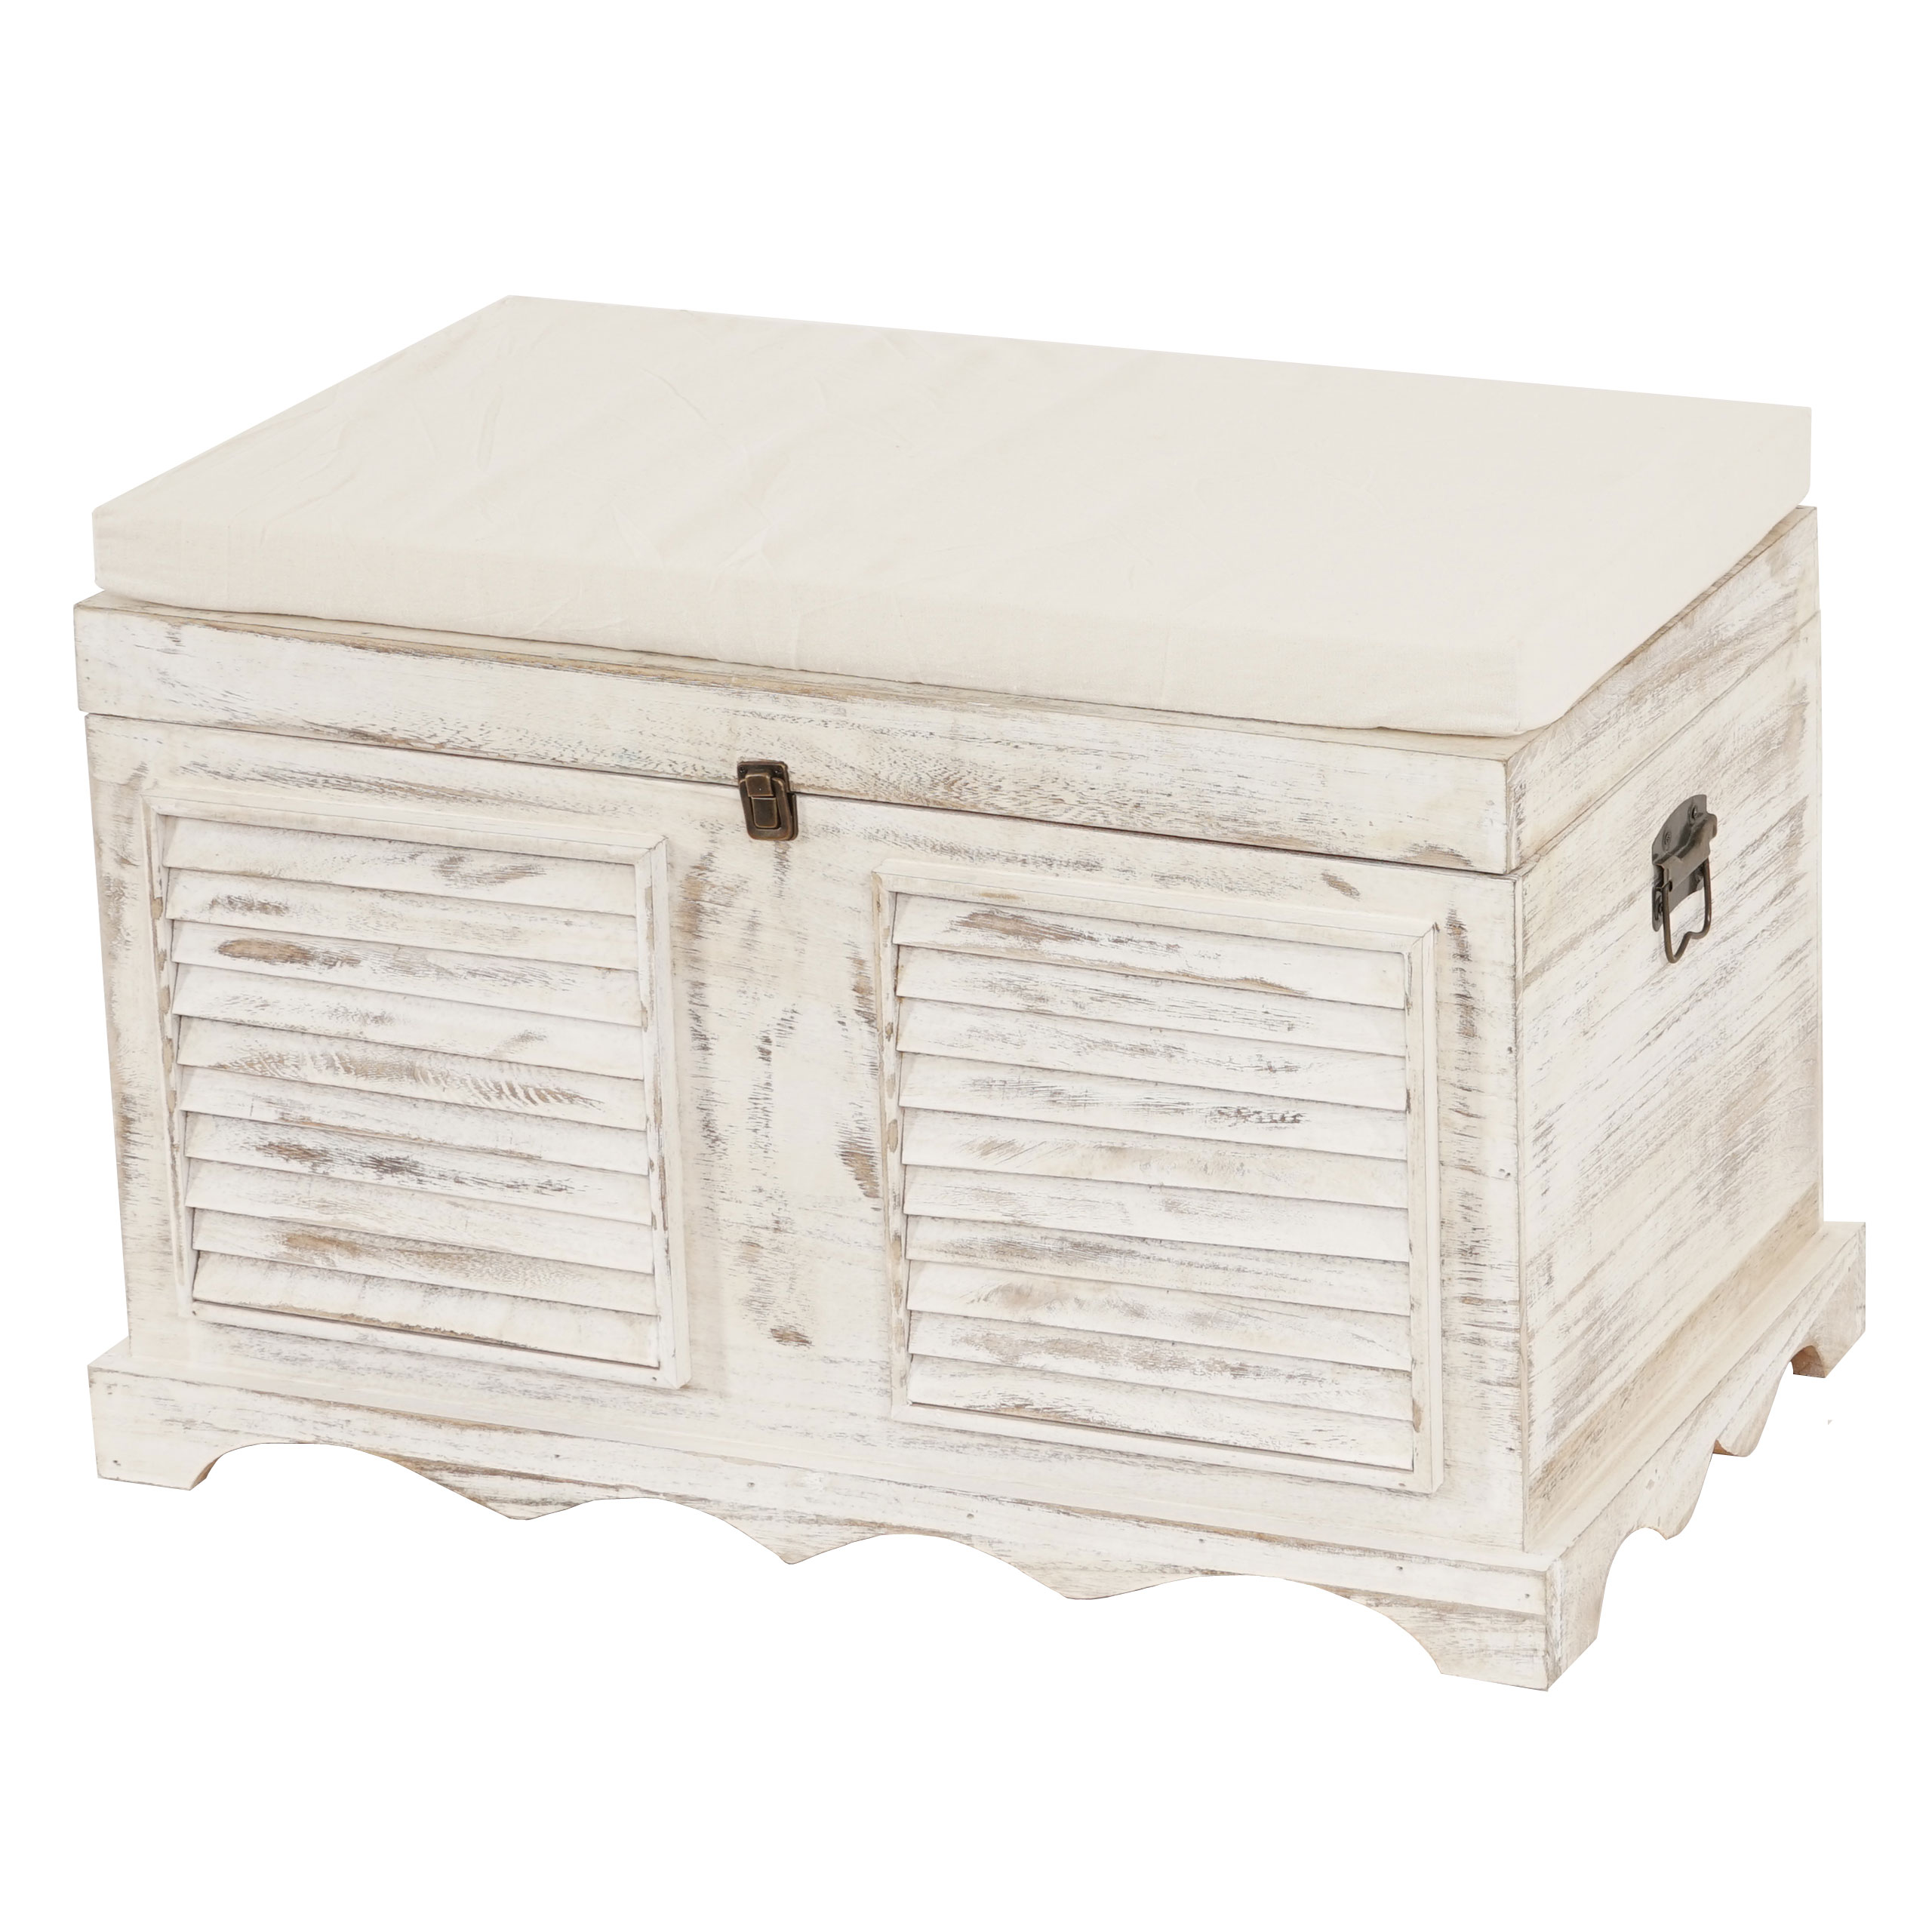 holztruhe t356 sitzbank aufbewahrungstruhe shabby look. Black Bedroom Furniture Sets. Home Design Ideas